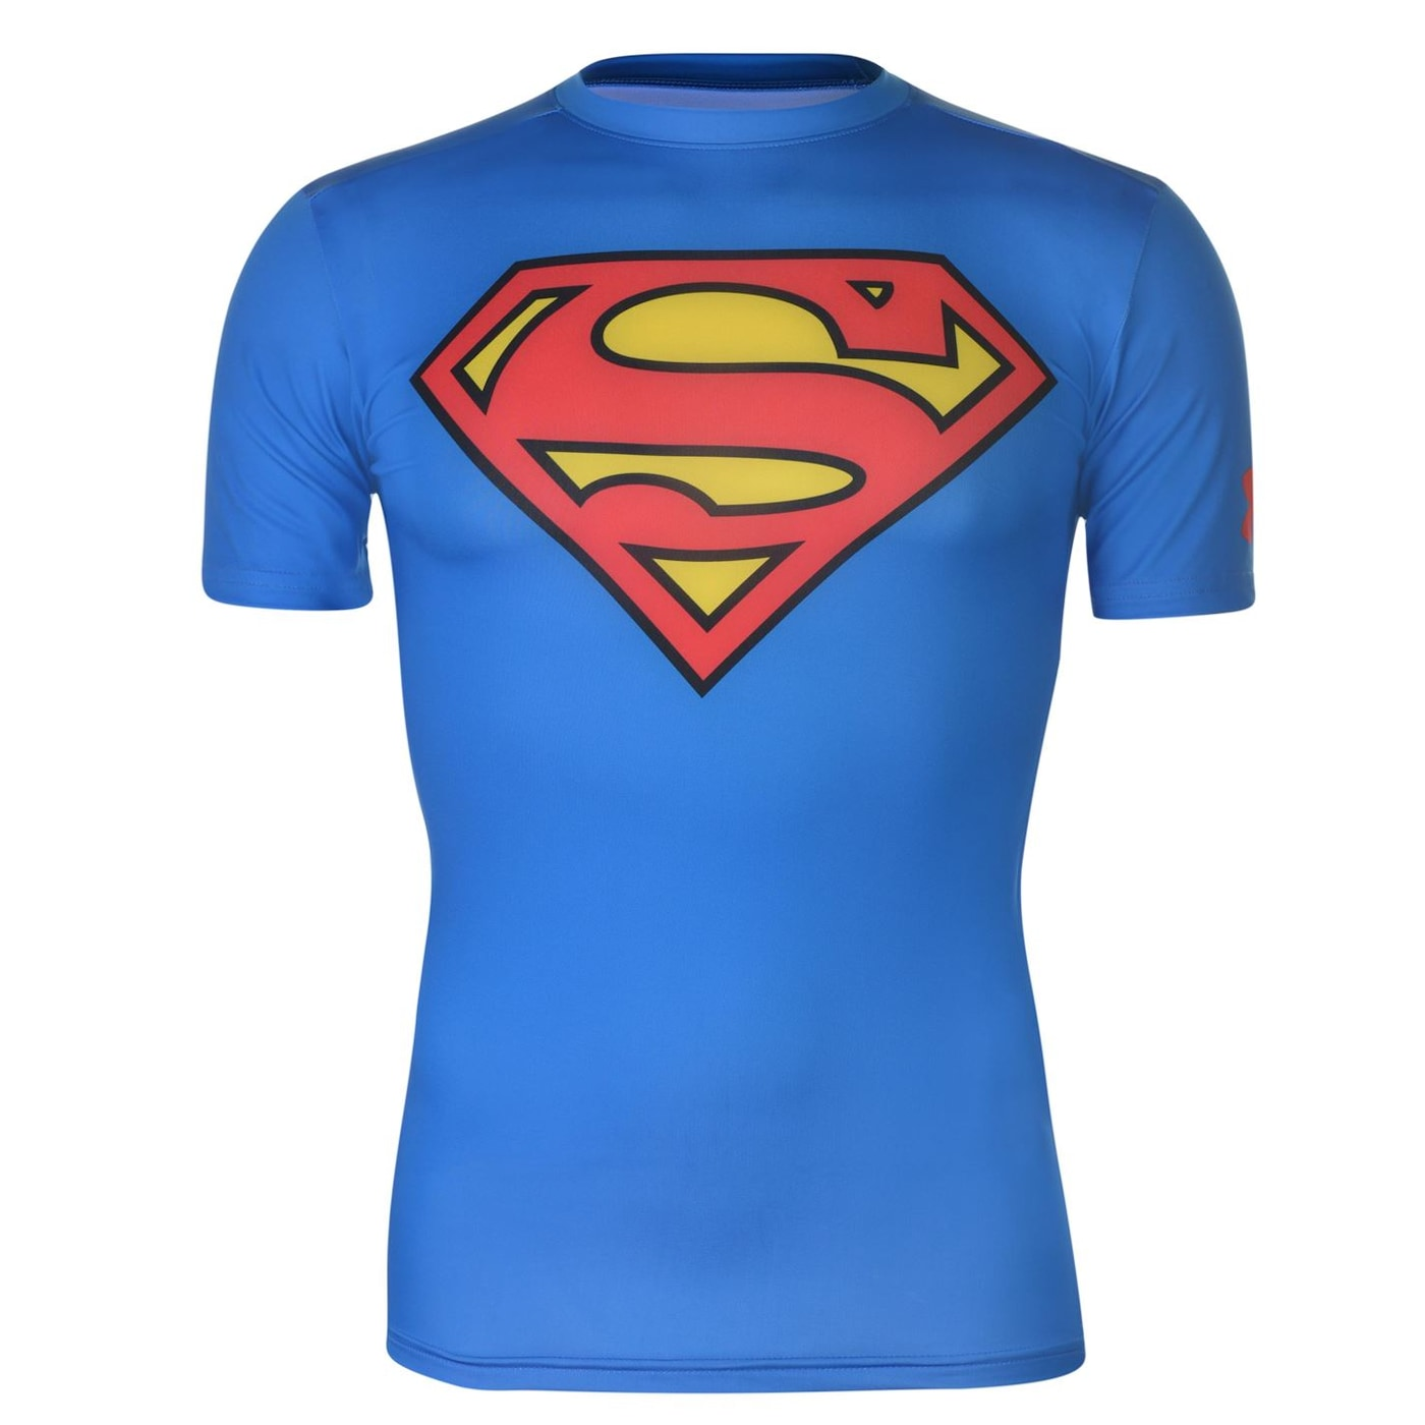 Under Armour Alter Ego Compression Short Sleeve Shirt Mens